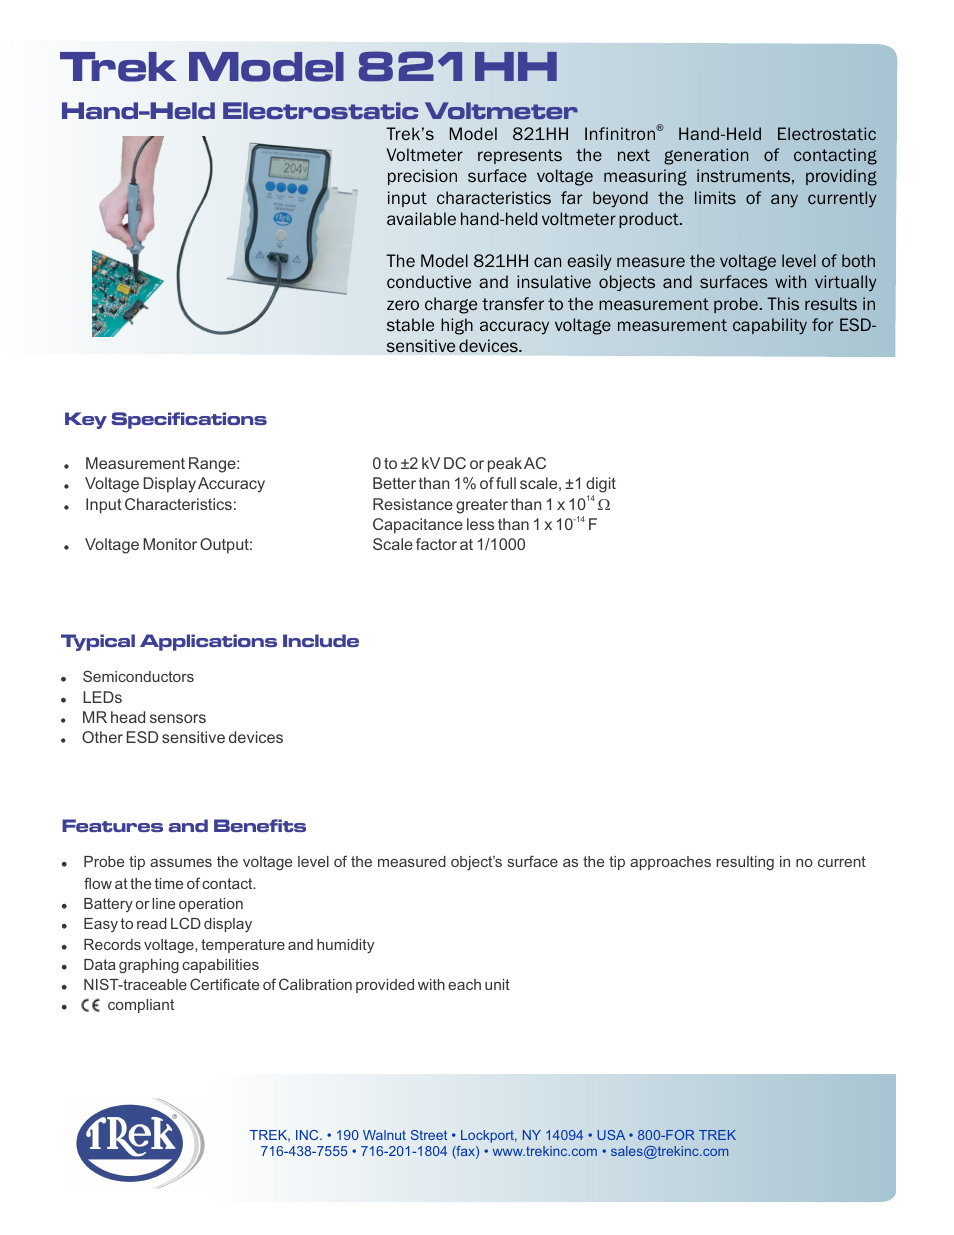 Trek 821HH Hand-Held Electrostatic Voltmeter User Manual | 2